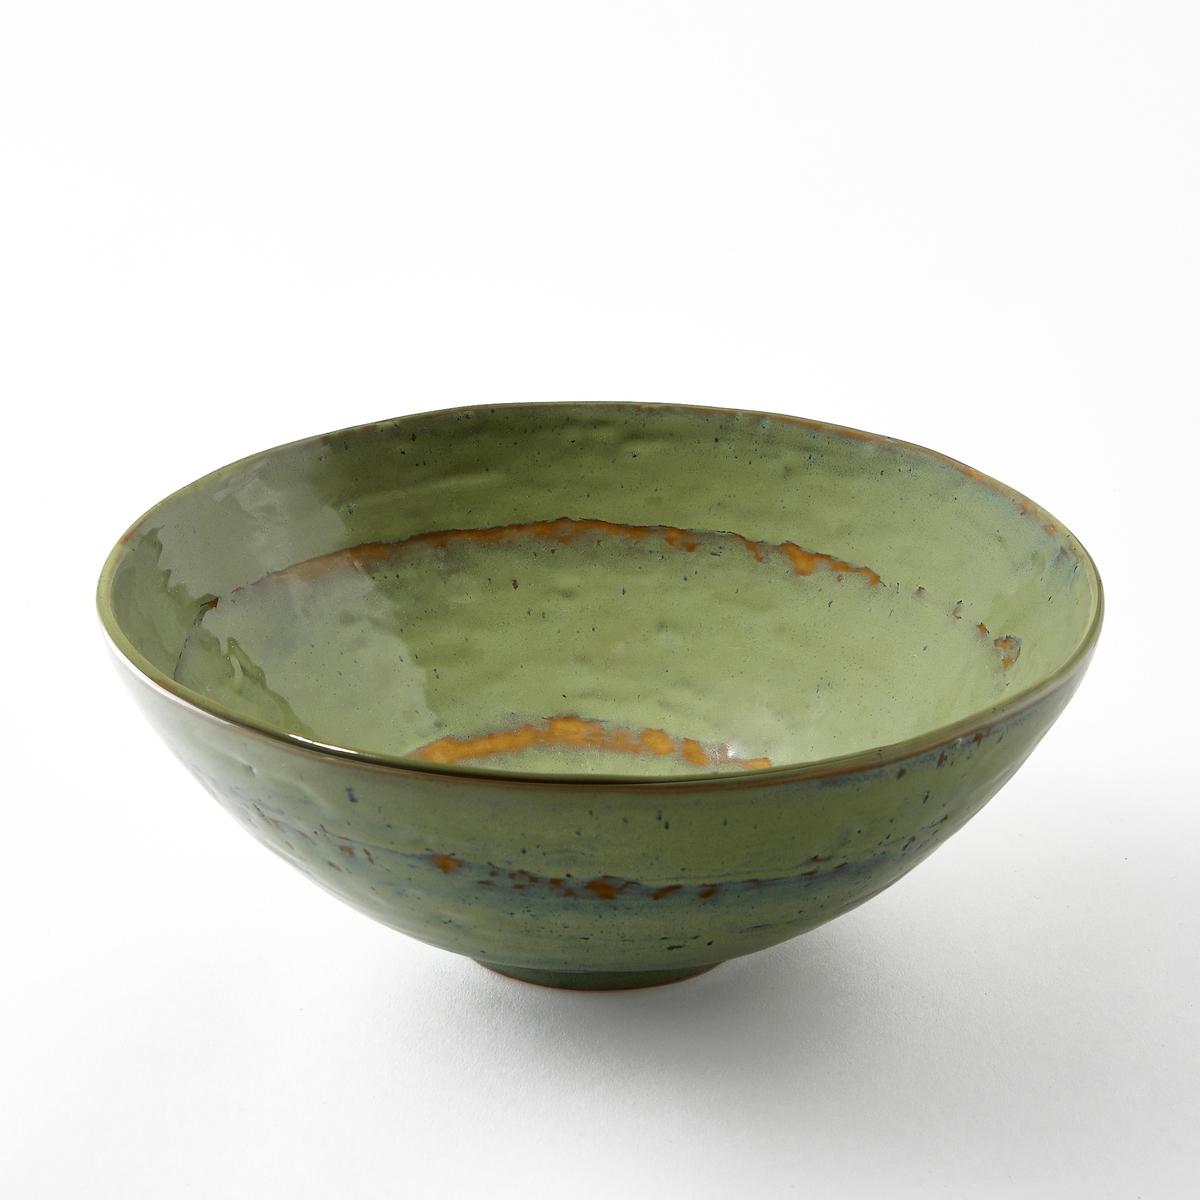 Салатница из керамики, покрытой глазурью, Pure, дизайн П. Нессенса, Serax